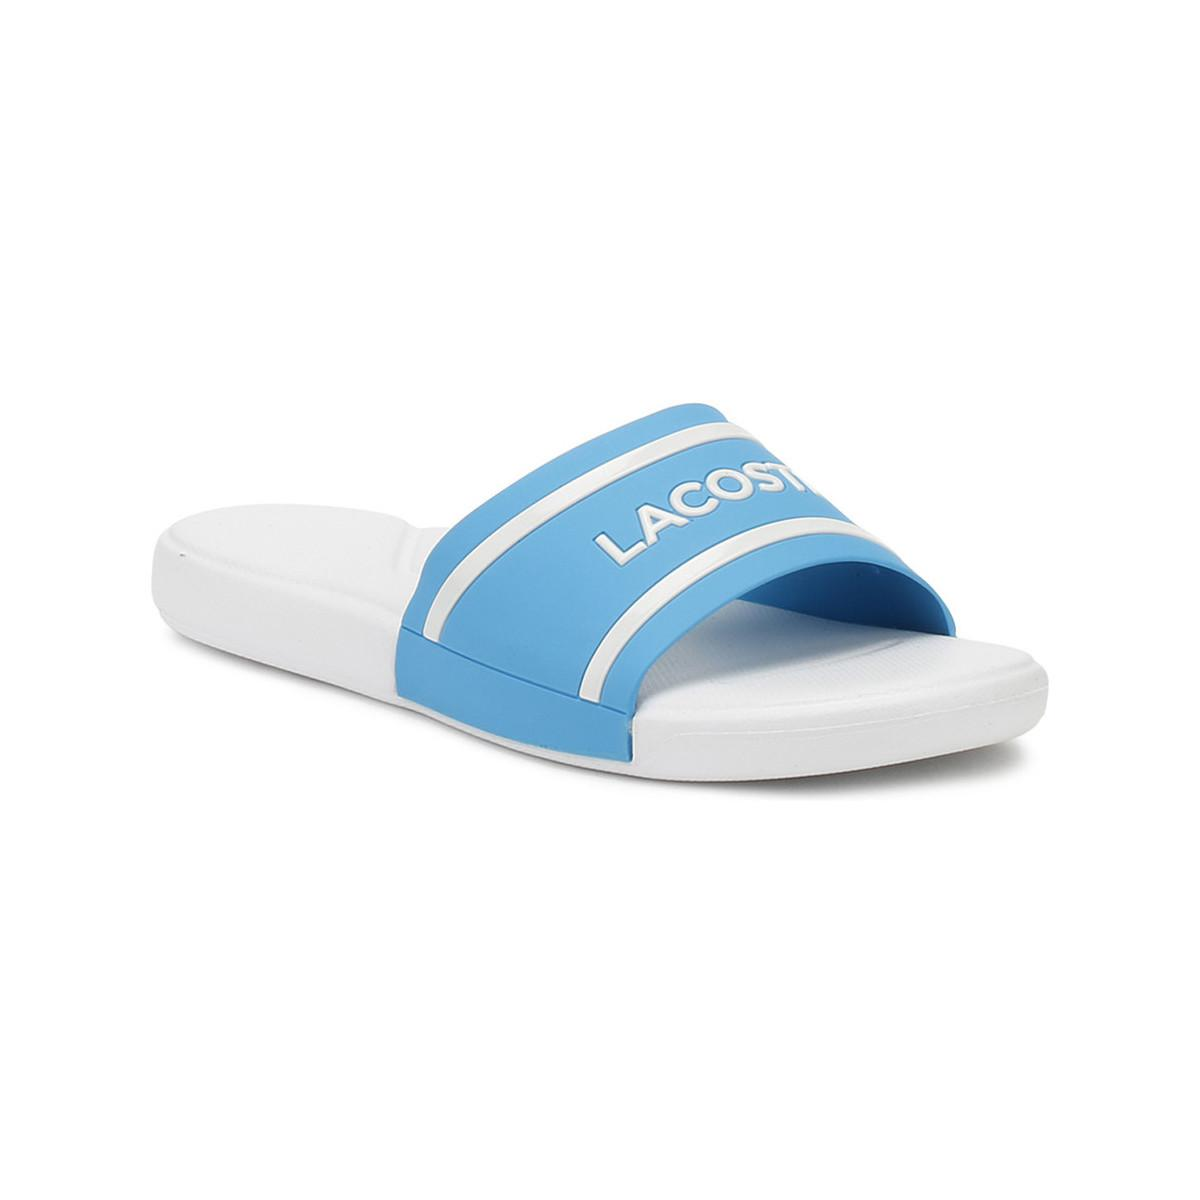 57b883600 Lacoste Junior Blue   White L.30 118 2 Slides Girls s In Blue in ...